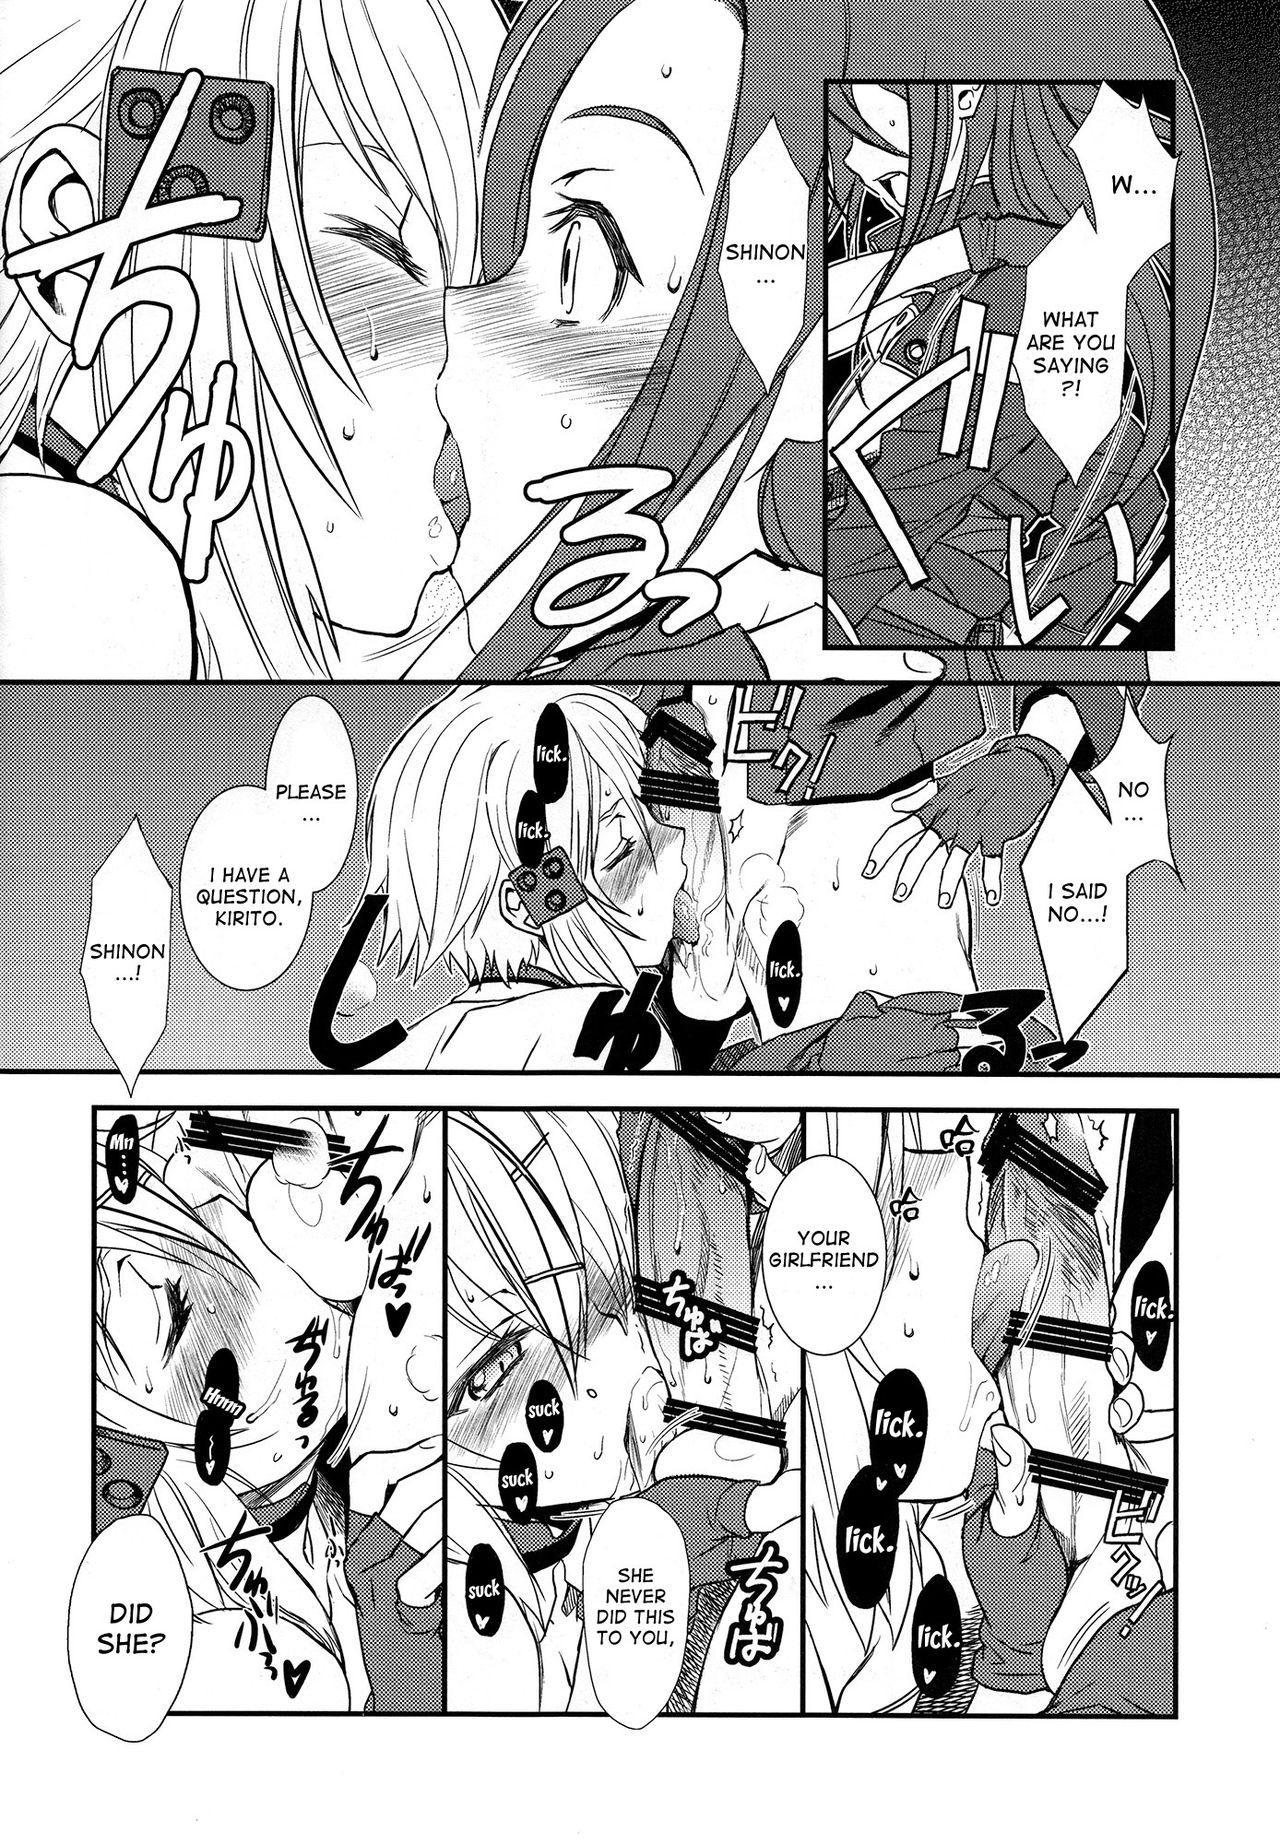 (C87) [TEX-MEX (Red Bear)] SSS Sinon-chan Sinon-chan Sukisuki (Sword Art Online) [English] [desudesu] 10